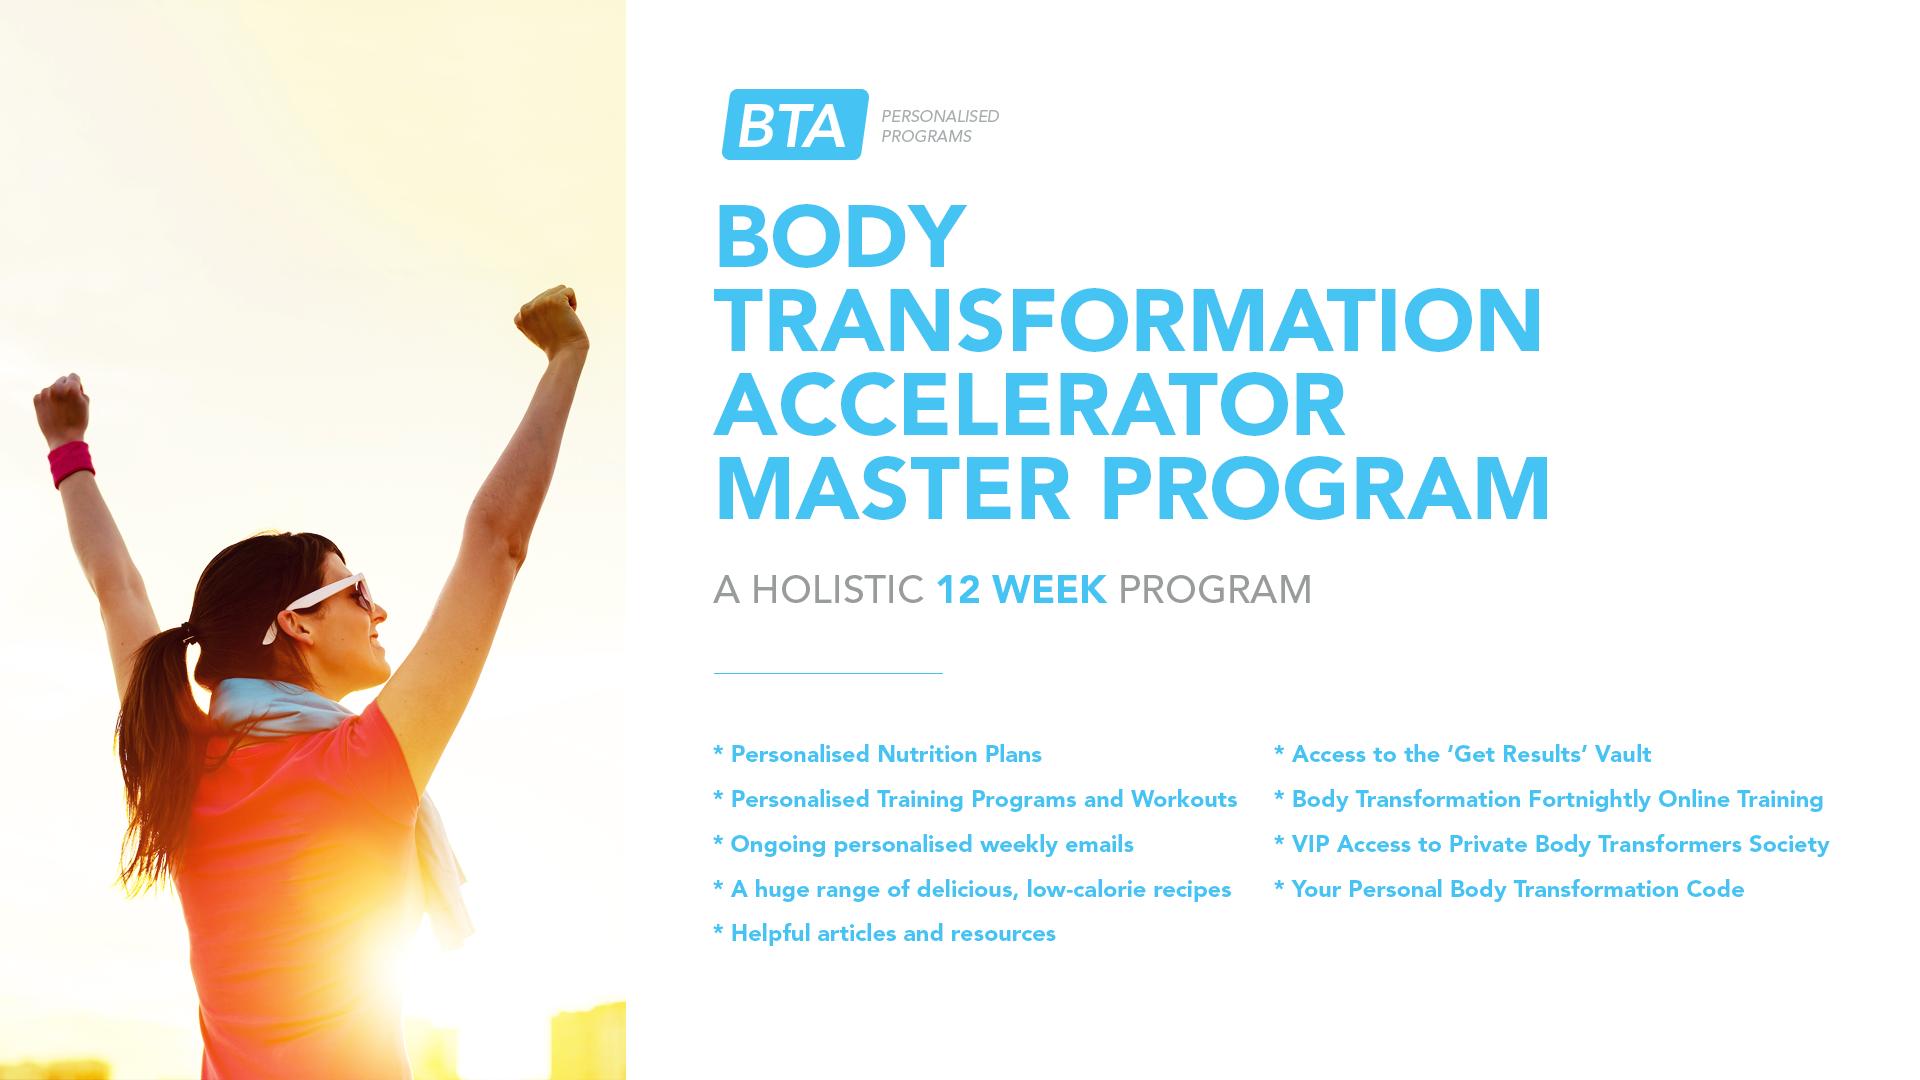 Body Transformation Accelerator Master Program